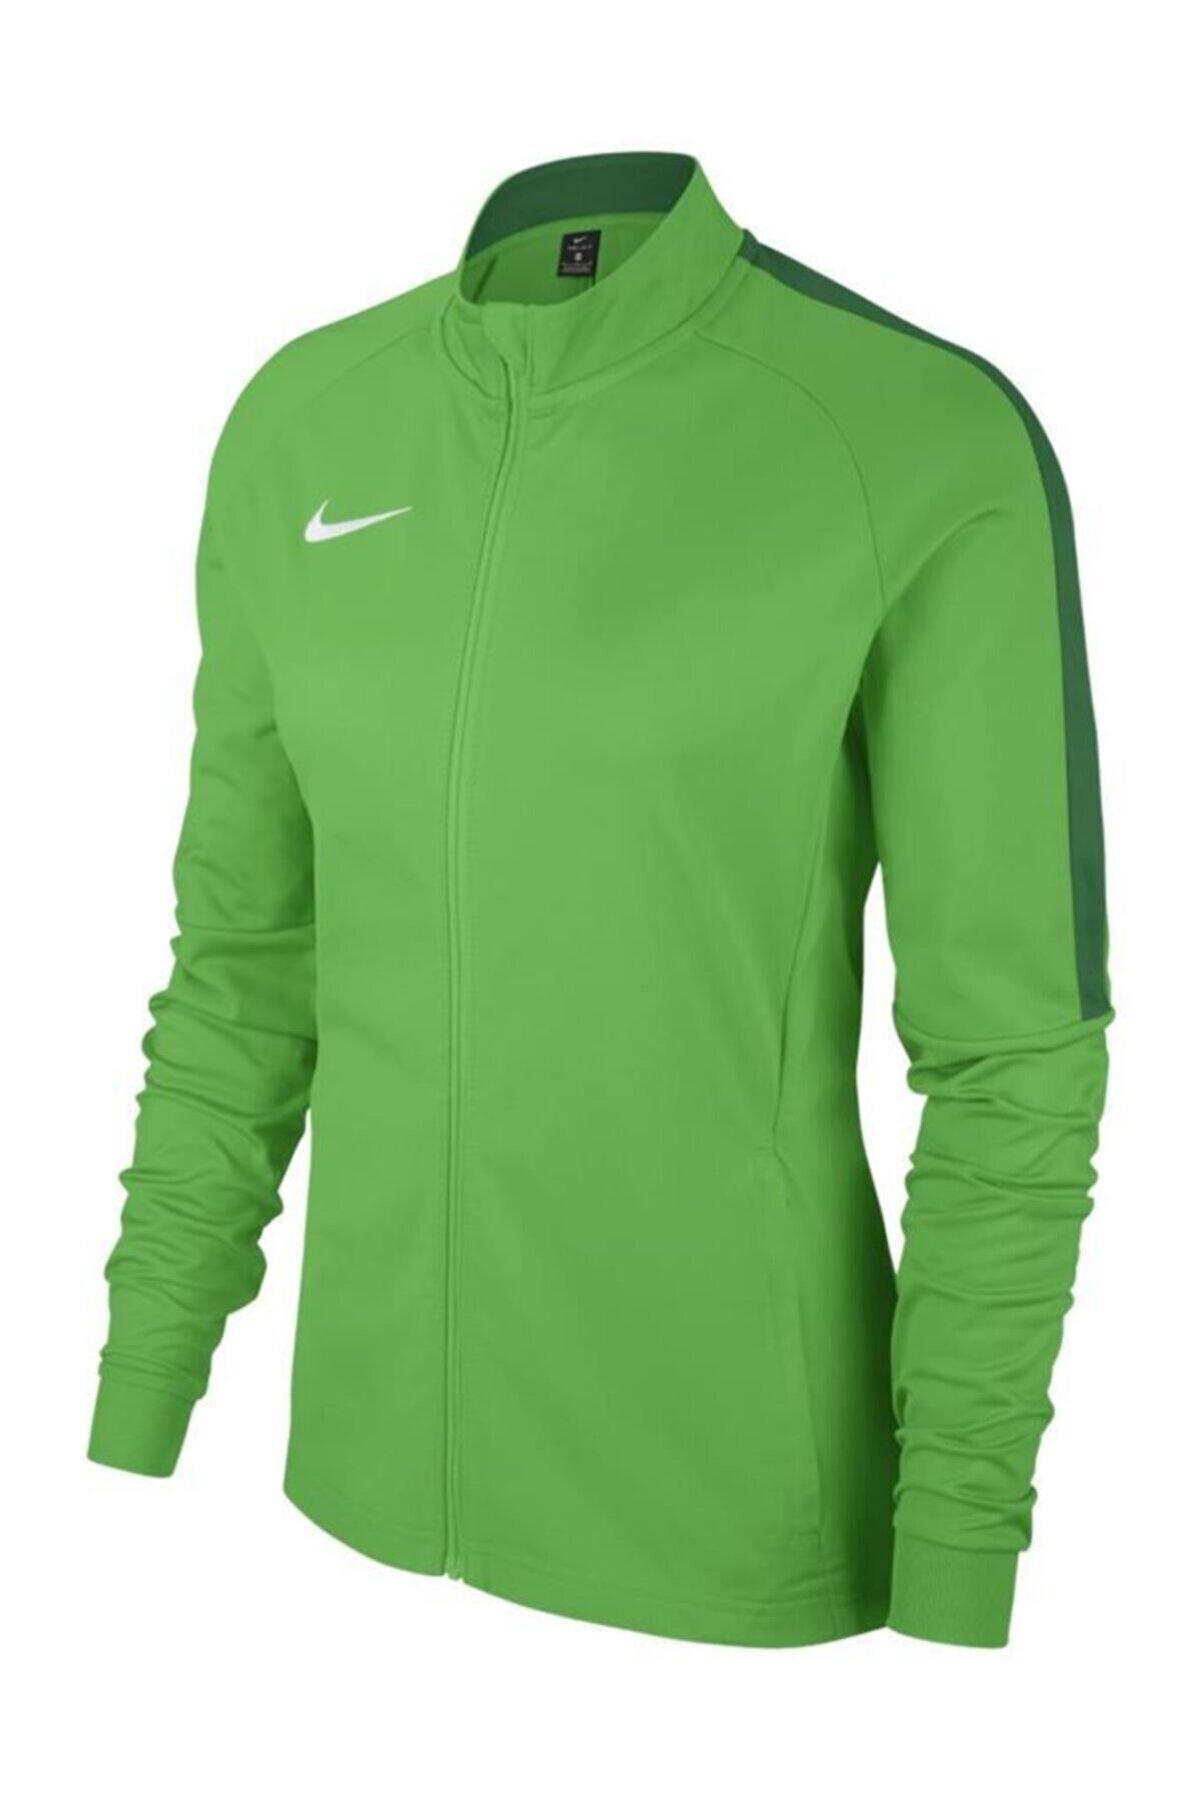 Nike Dry Academy18 893767-361 Bayan Eşofman Üst